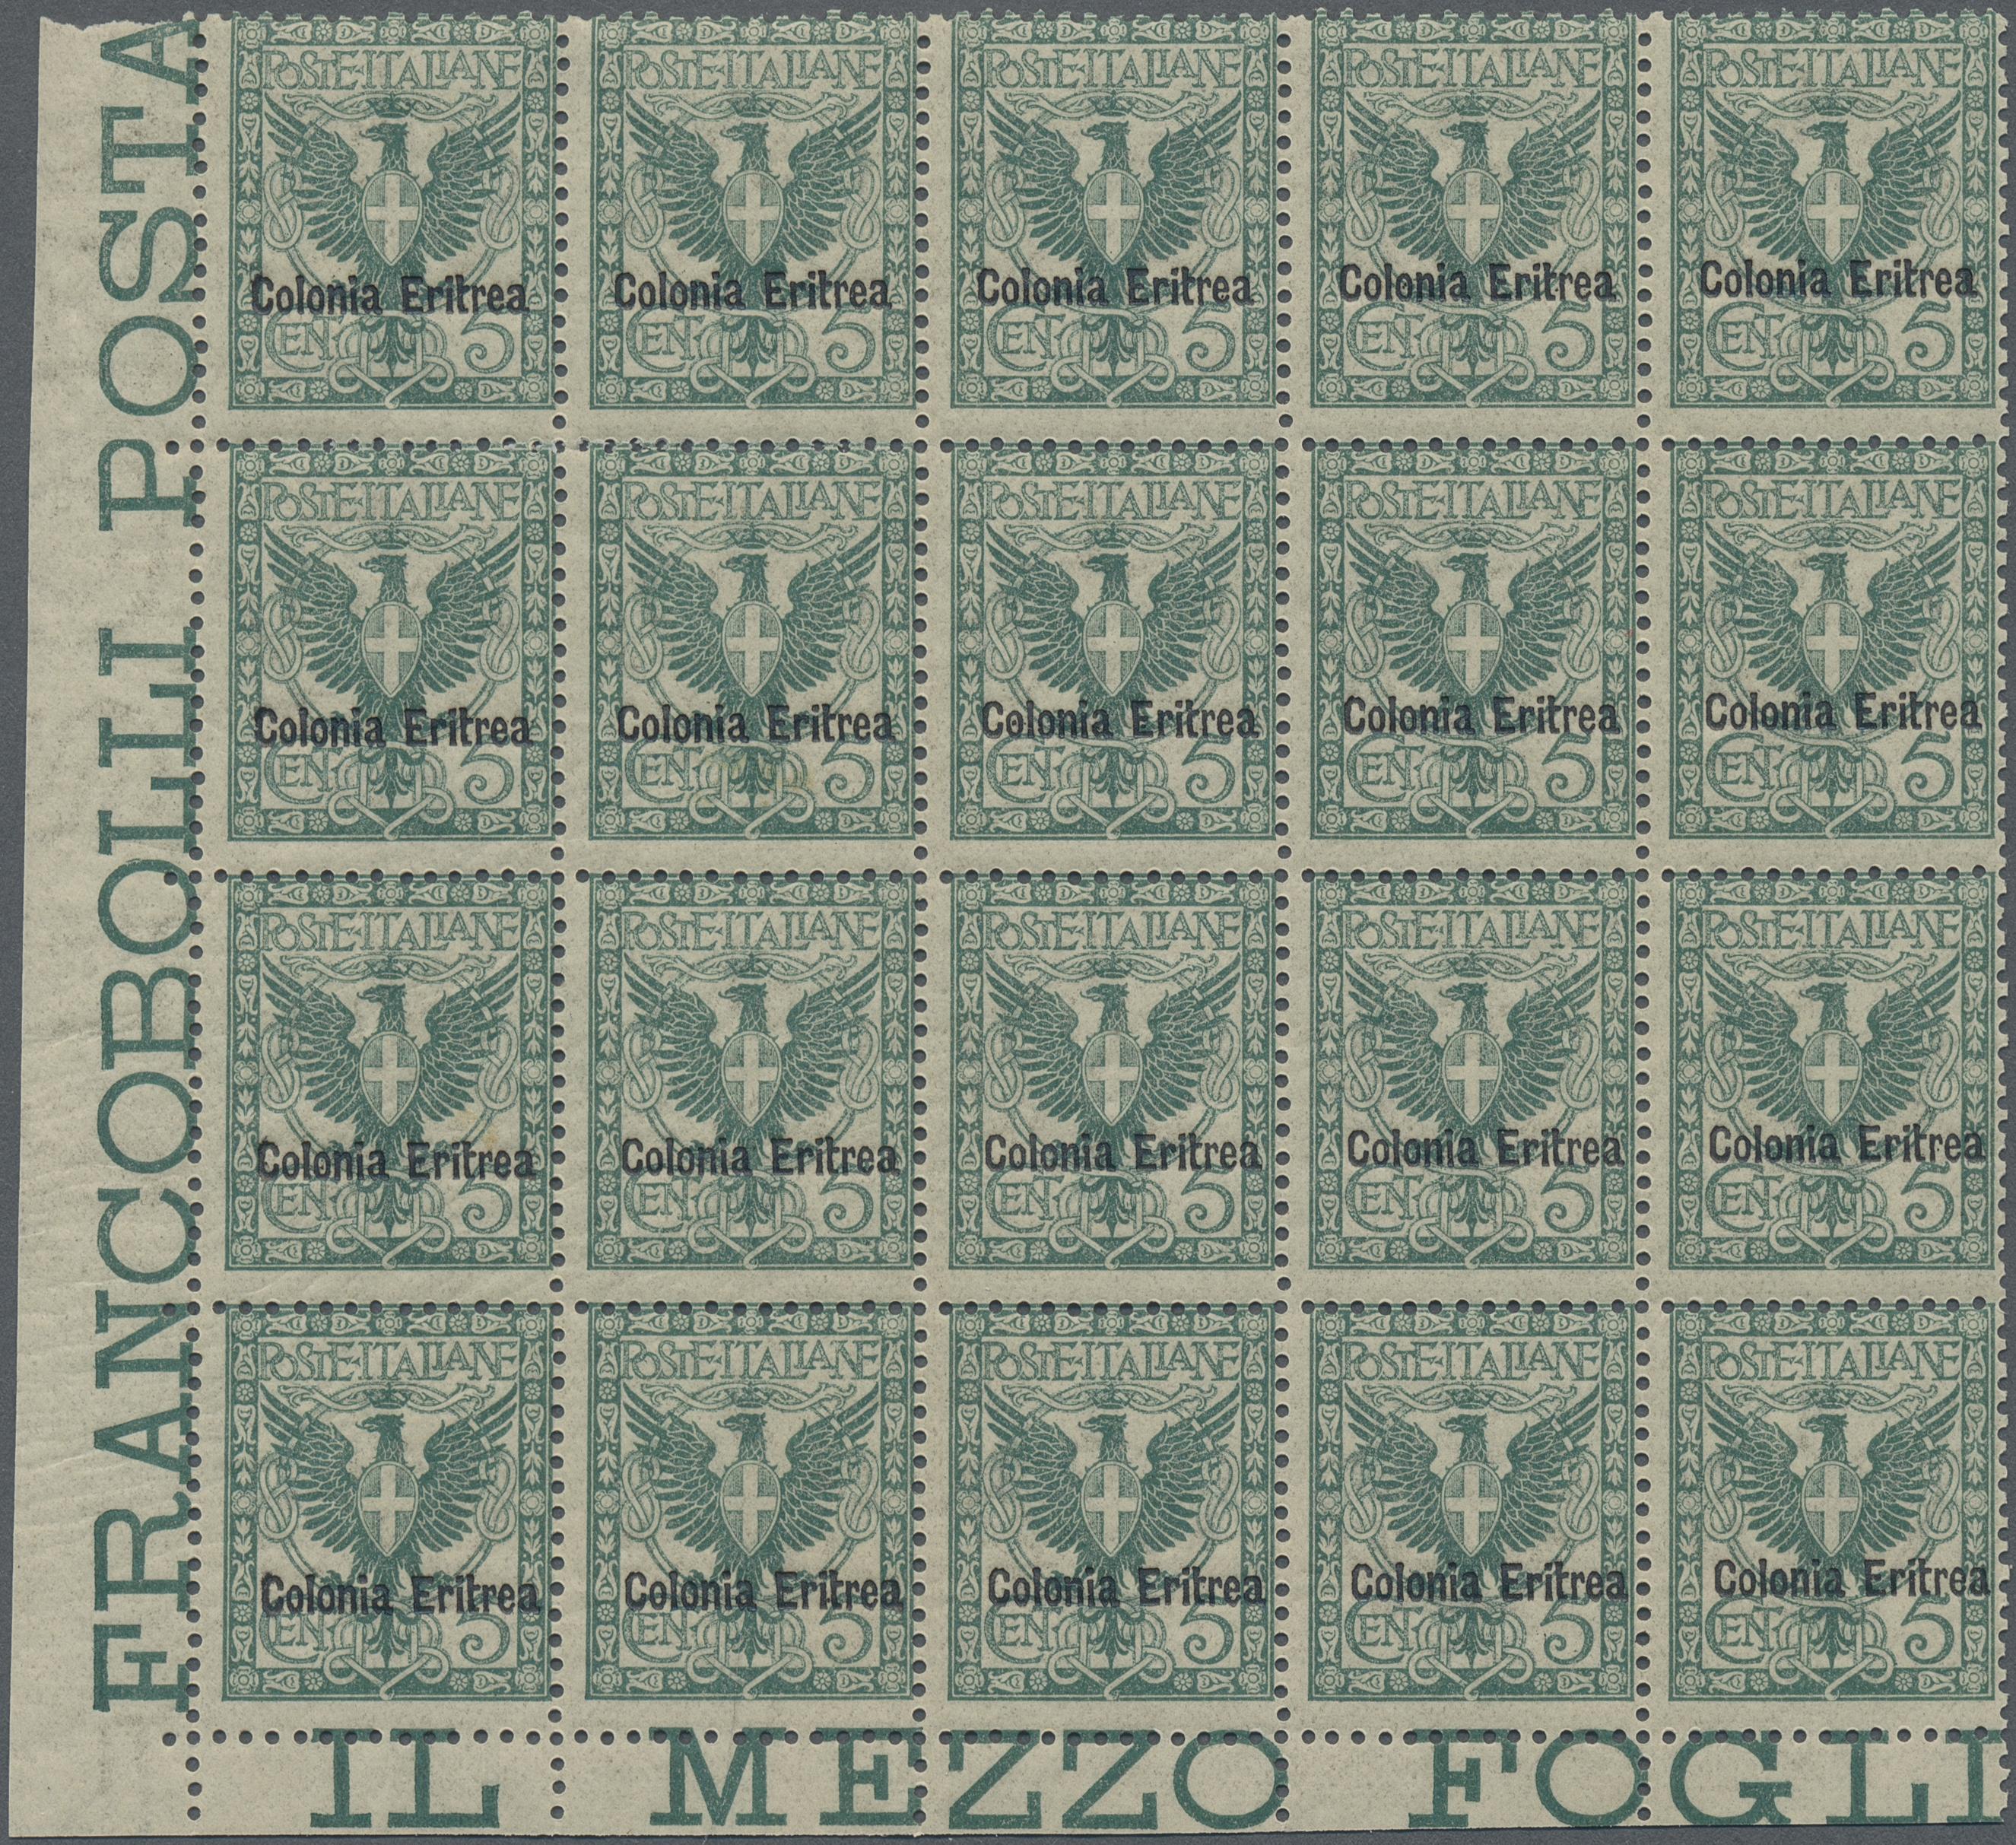 Lot 00870 - italienisch-eritrea  -  Auktionshaus Christoph Gärtner GmbH & Co. KG Special auction